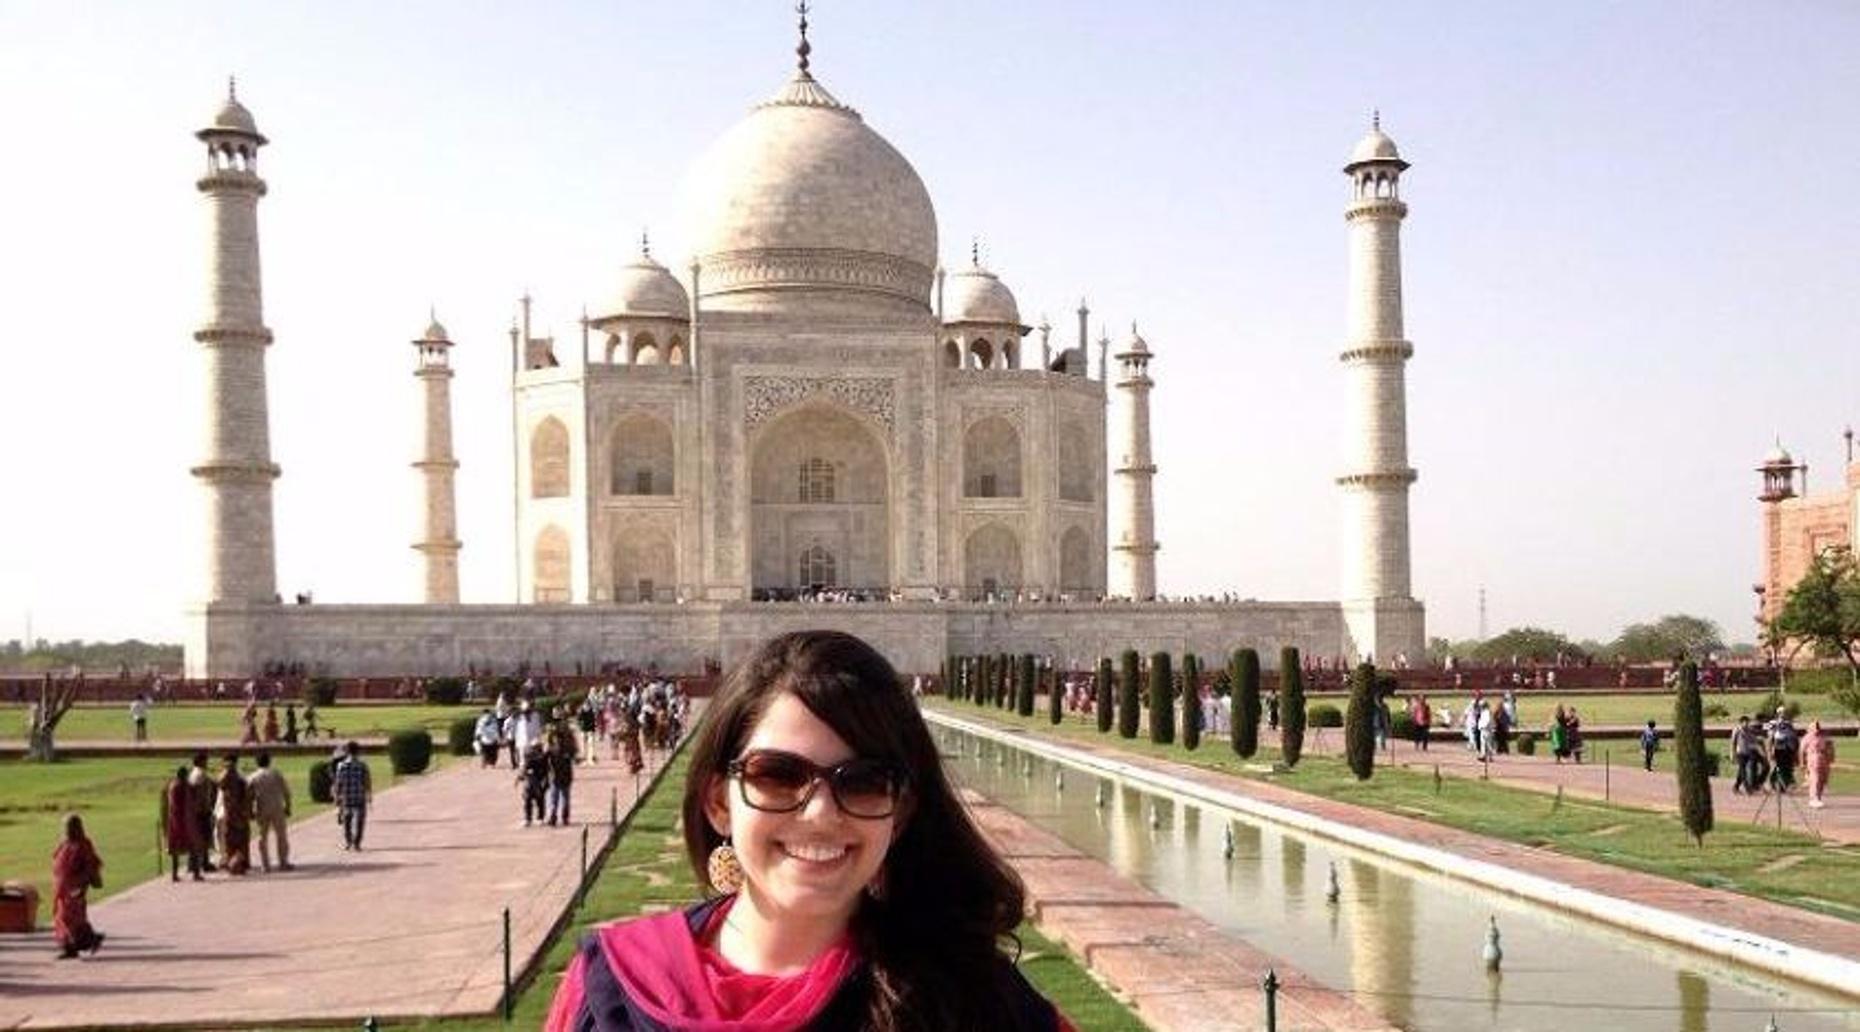 Taj Mahal & Agra Fort Private Tour from Delhi